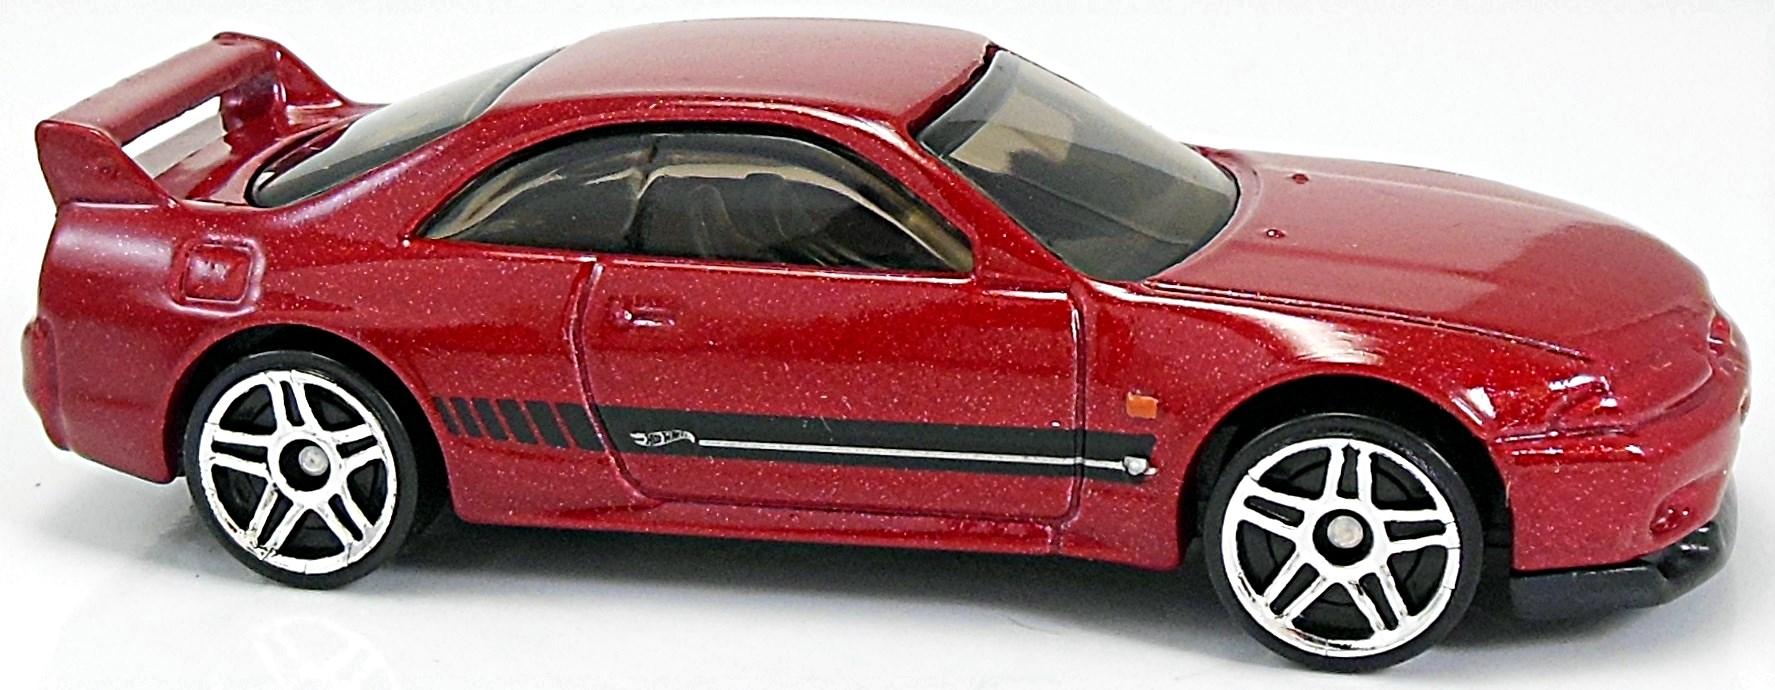 Nissan Skyline Gt R R33 71mm 2018 Hot Wheels Newsletter